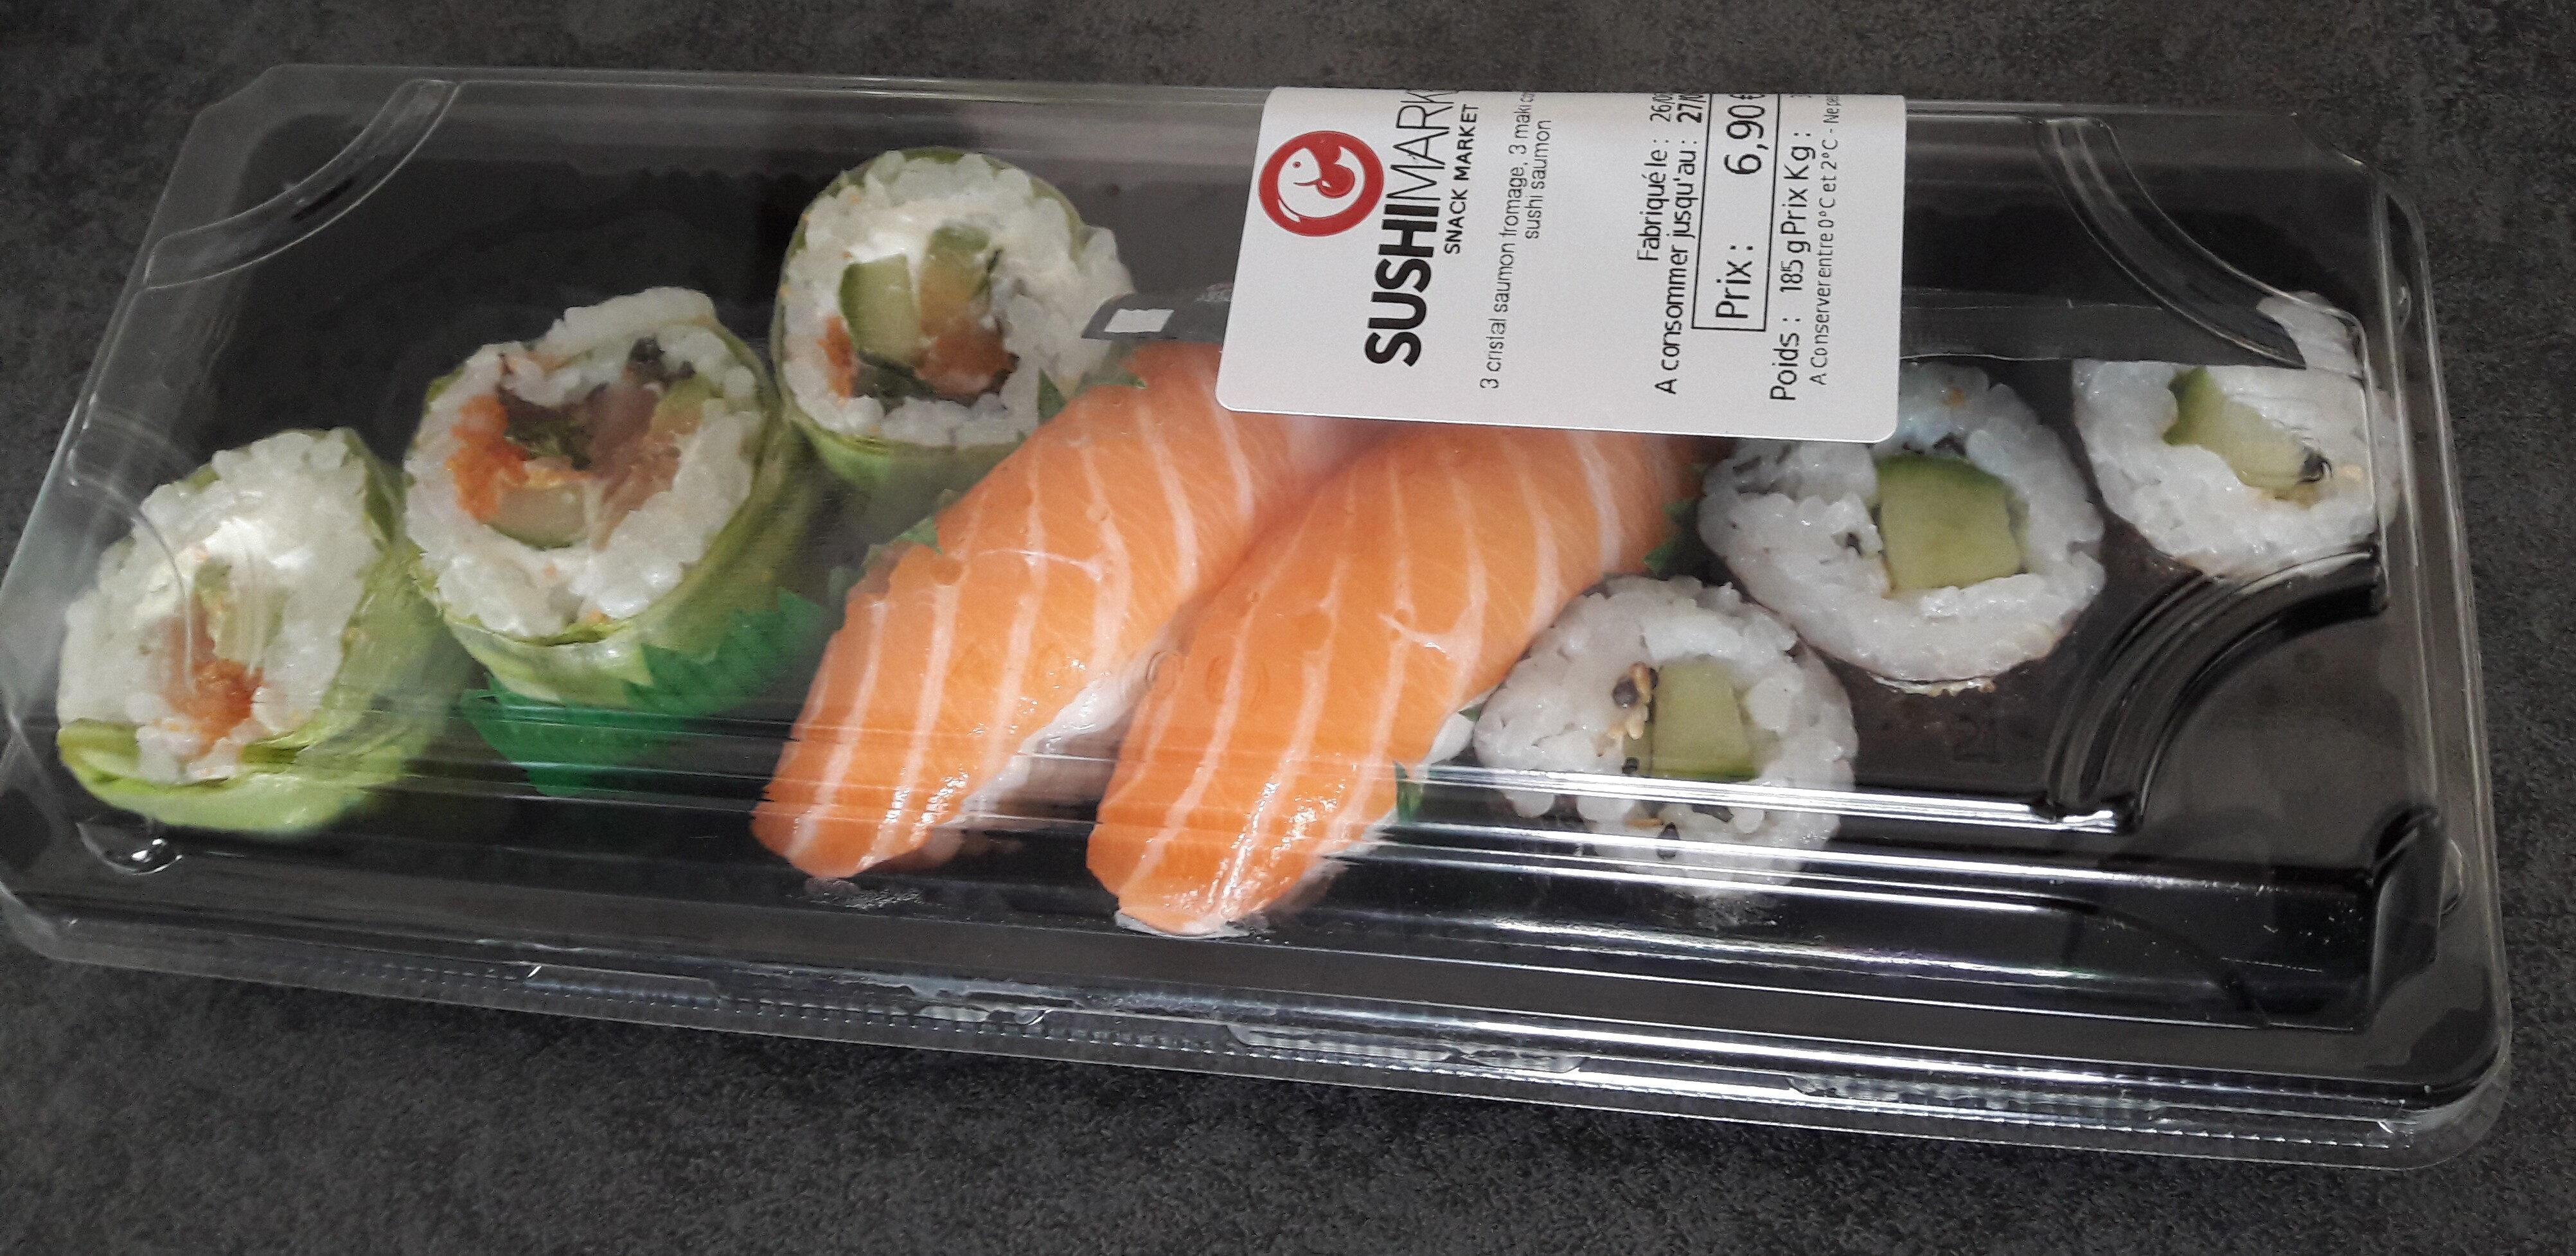 3 cristal saumon fromage, 3 maki concombre, 2 sushis saumon - Product - fr